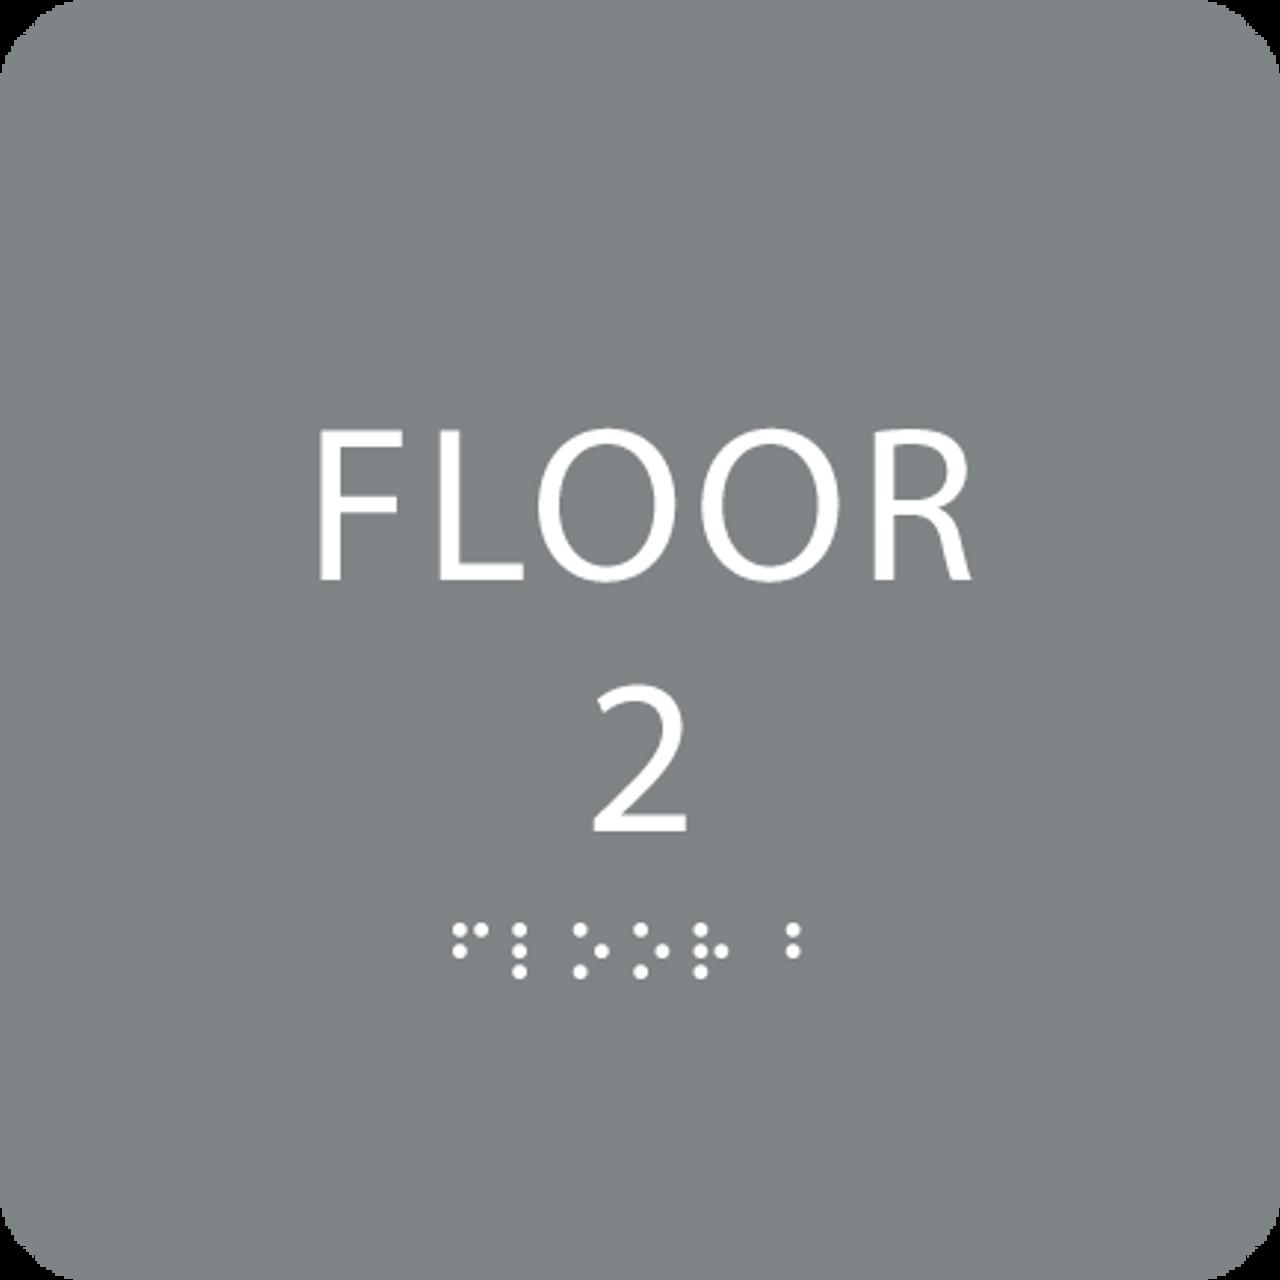 Grey Floor 2 Identification Sign